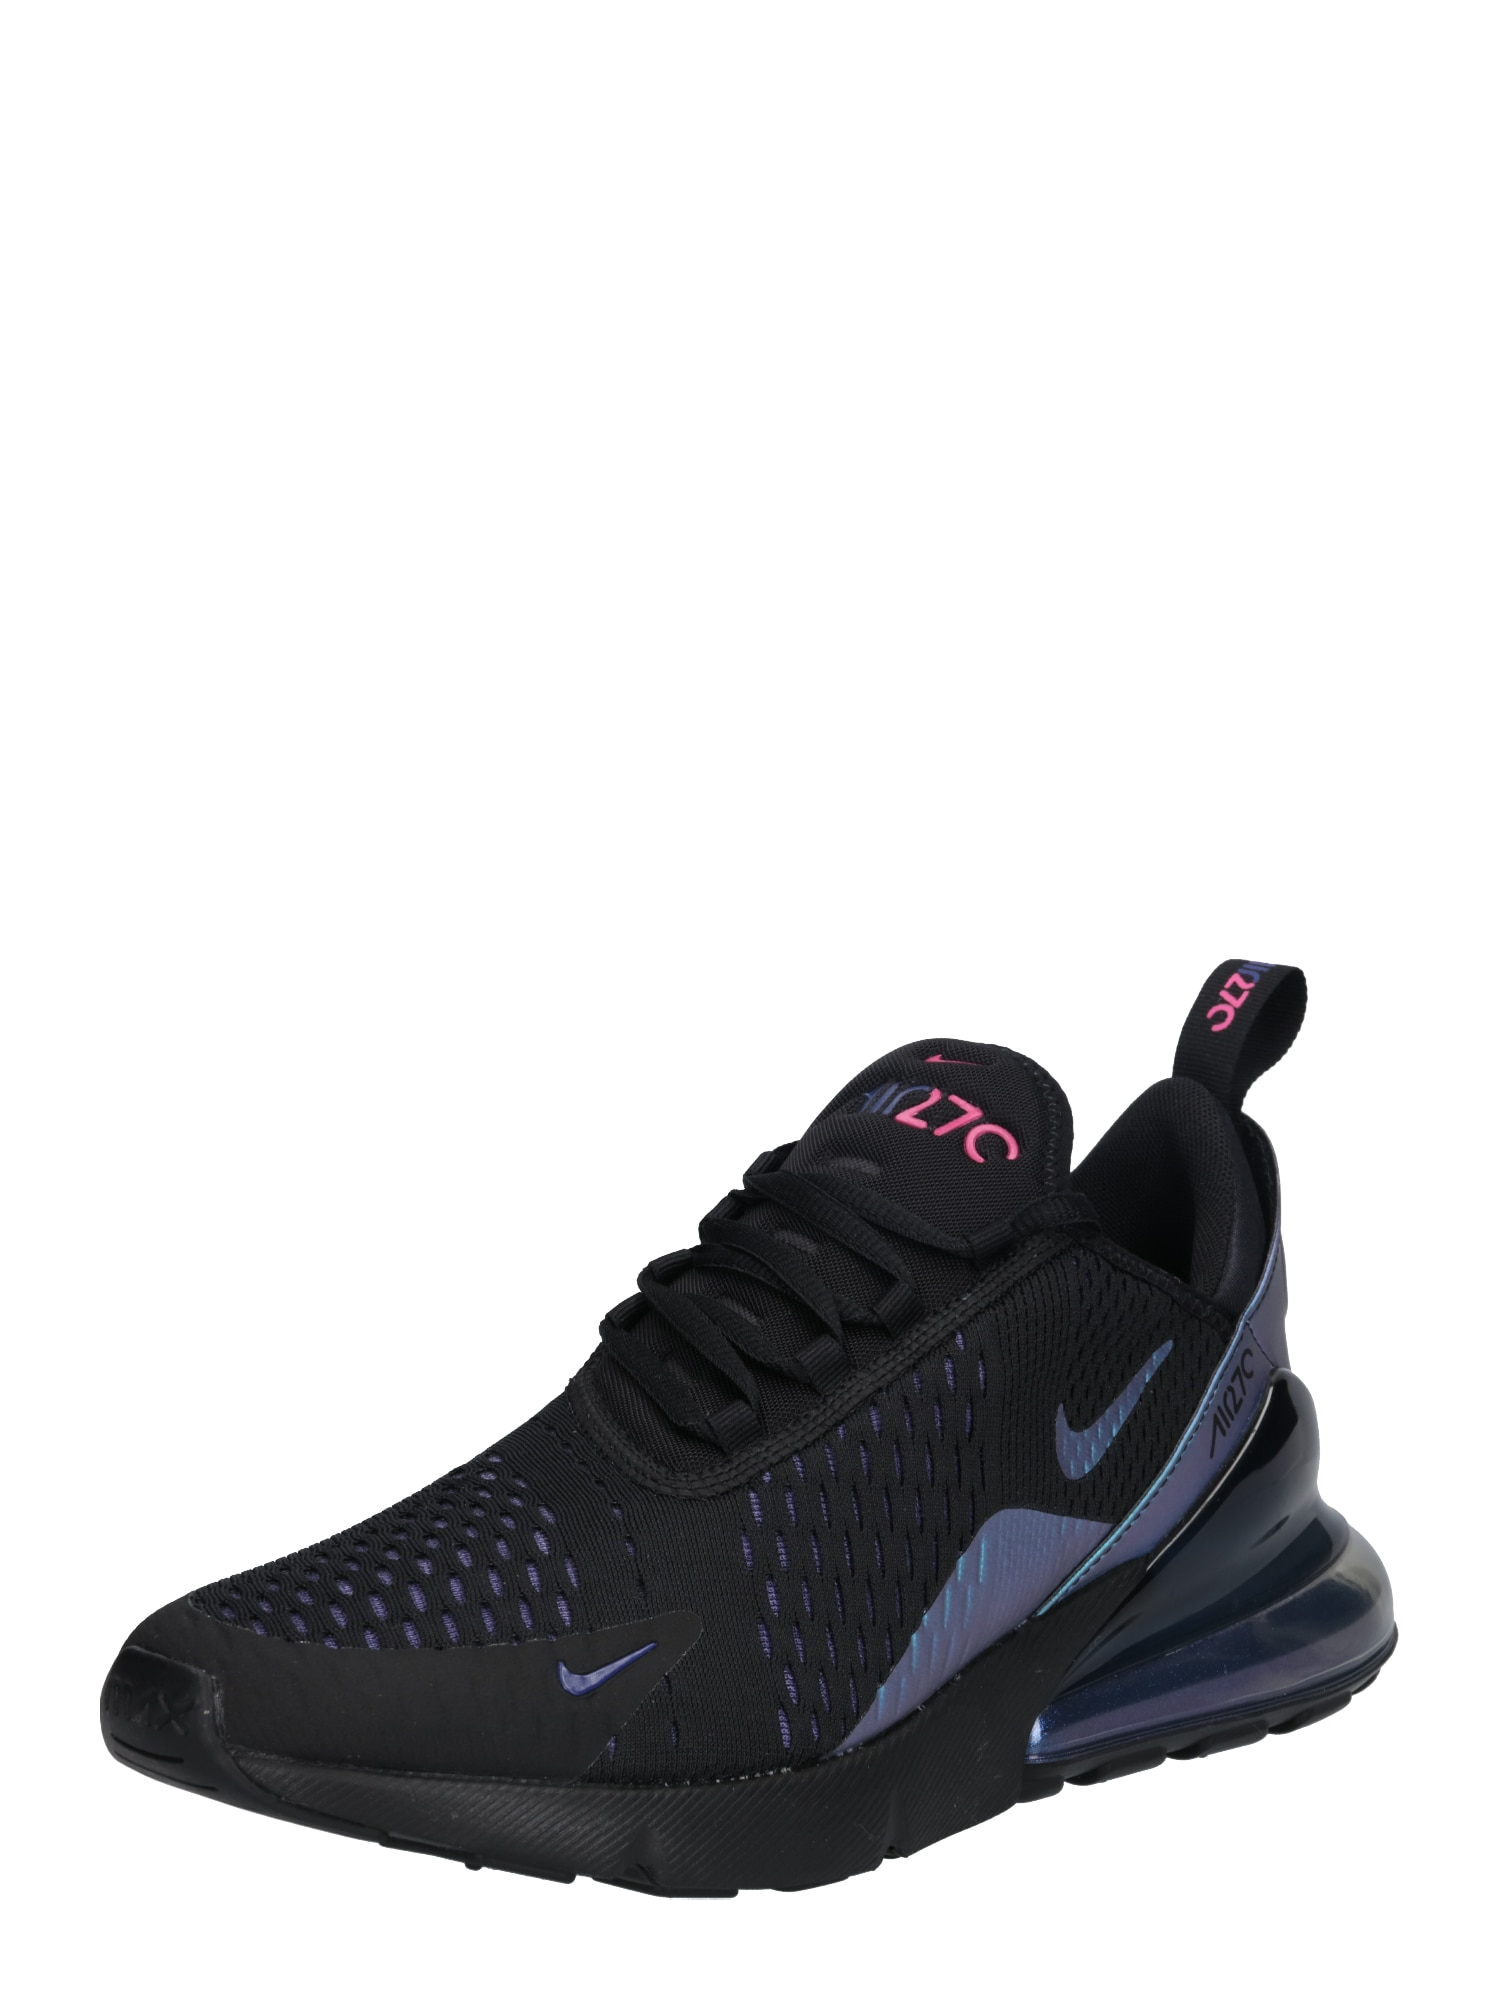 Nike Sportswear, Heren Sneakers laag 'Air Max 270', gemengde kleuren / zwart